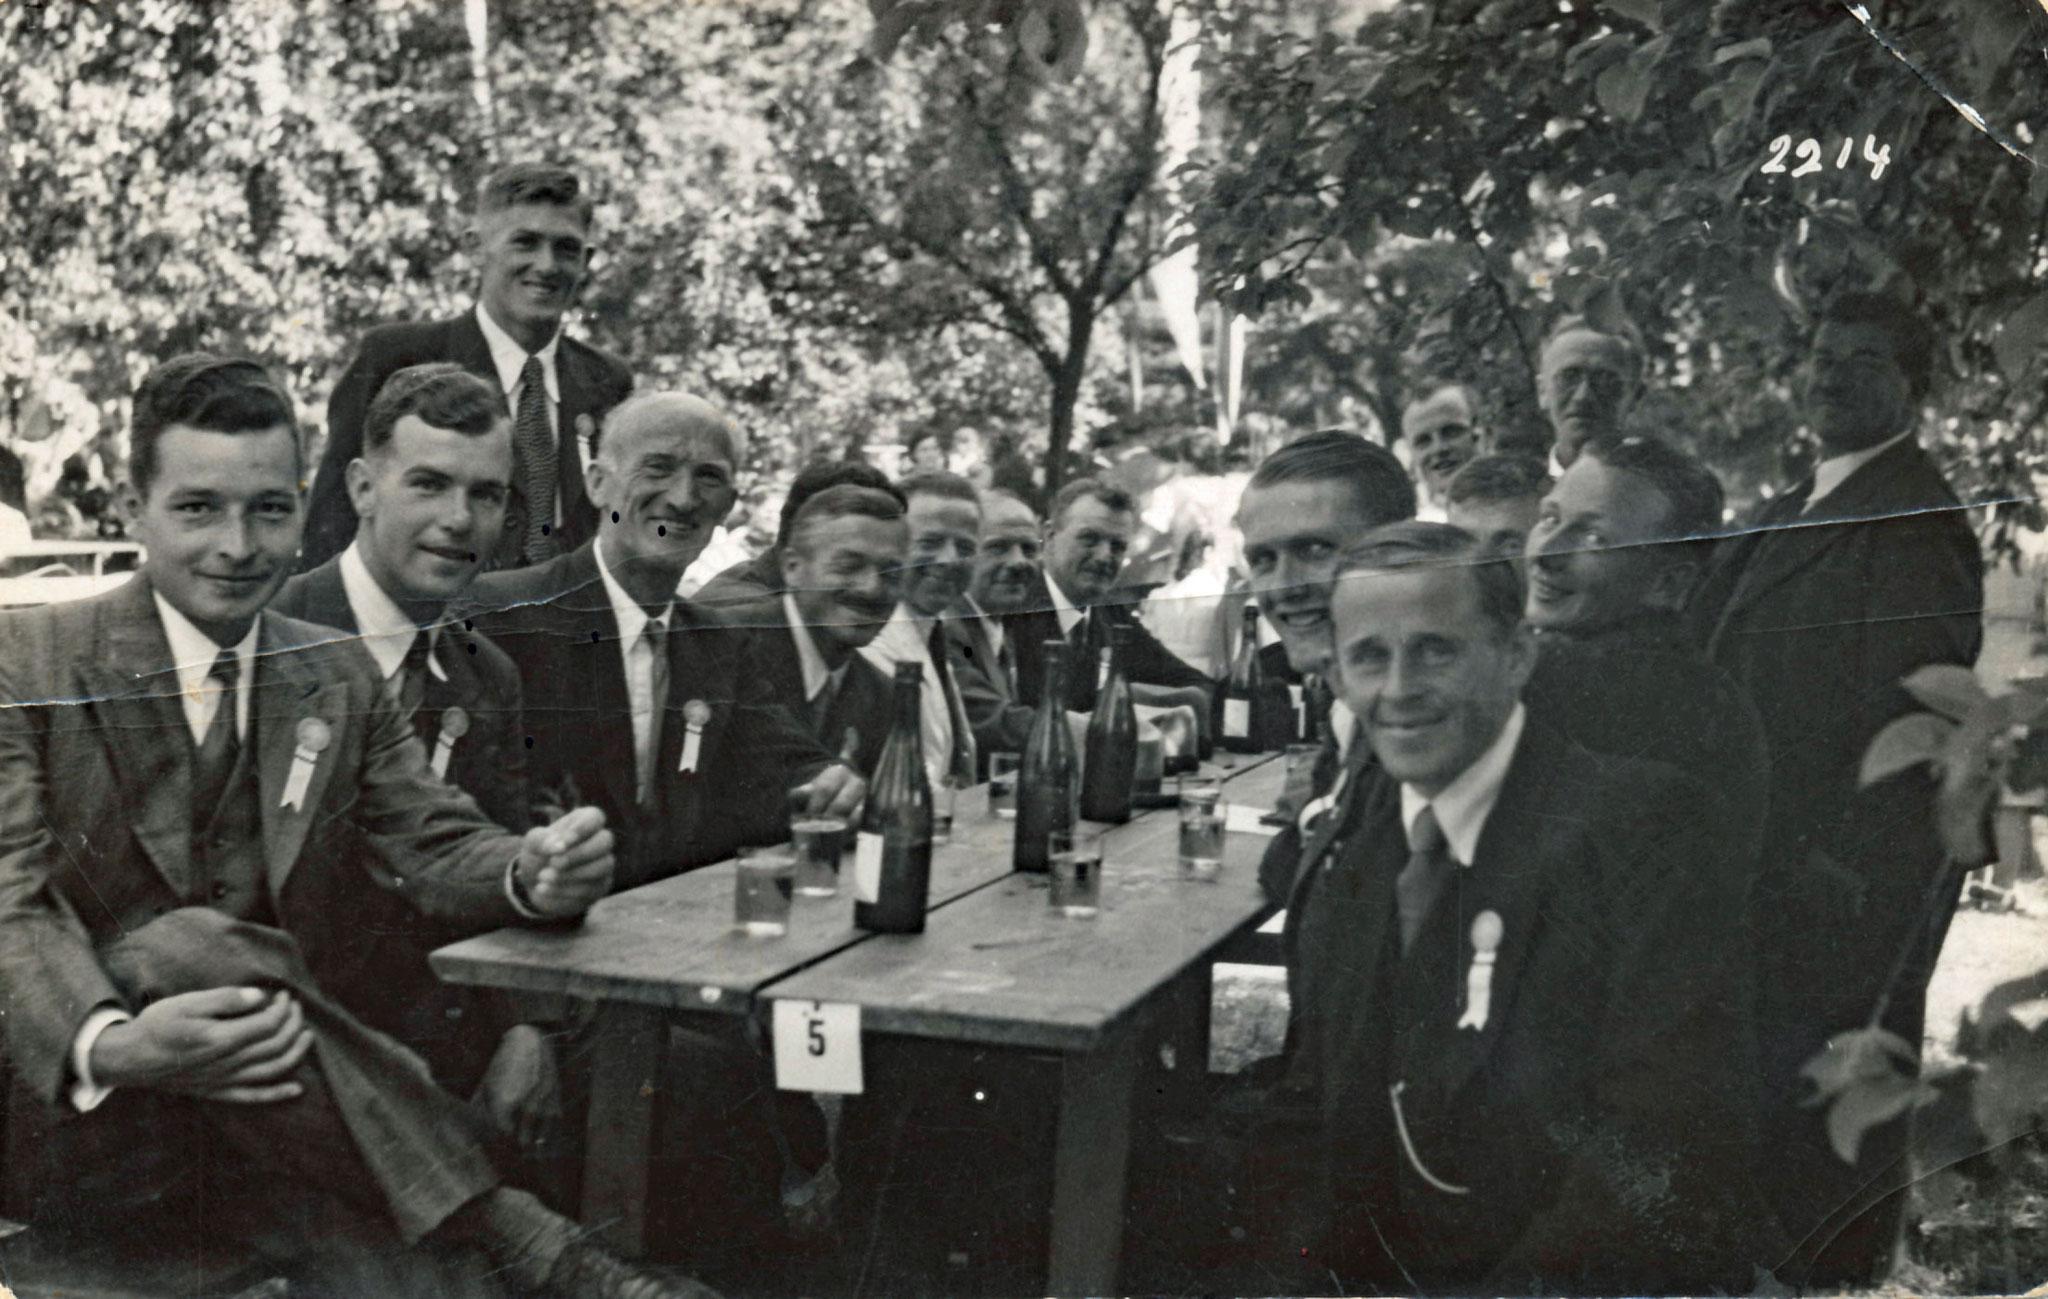 Sängerfest Regensdorf 1958